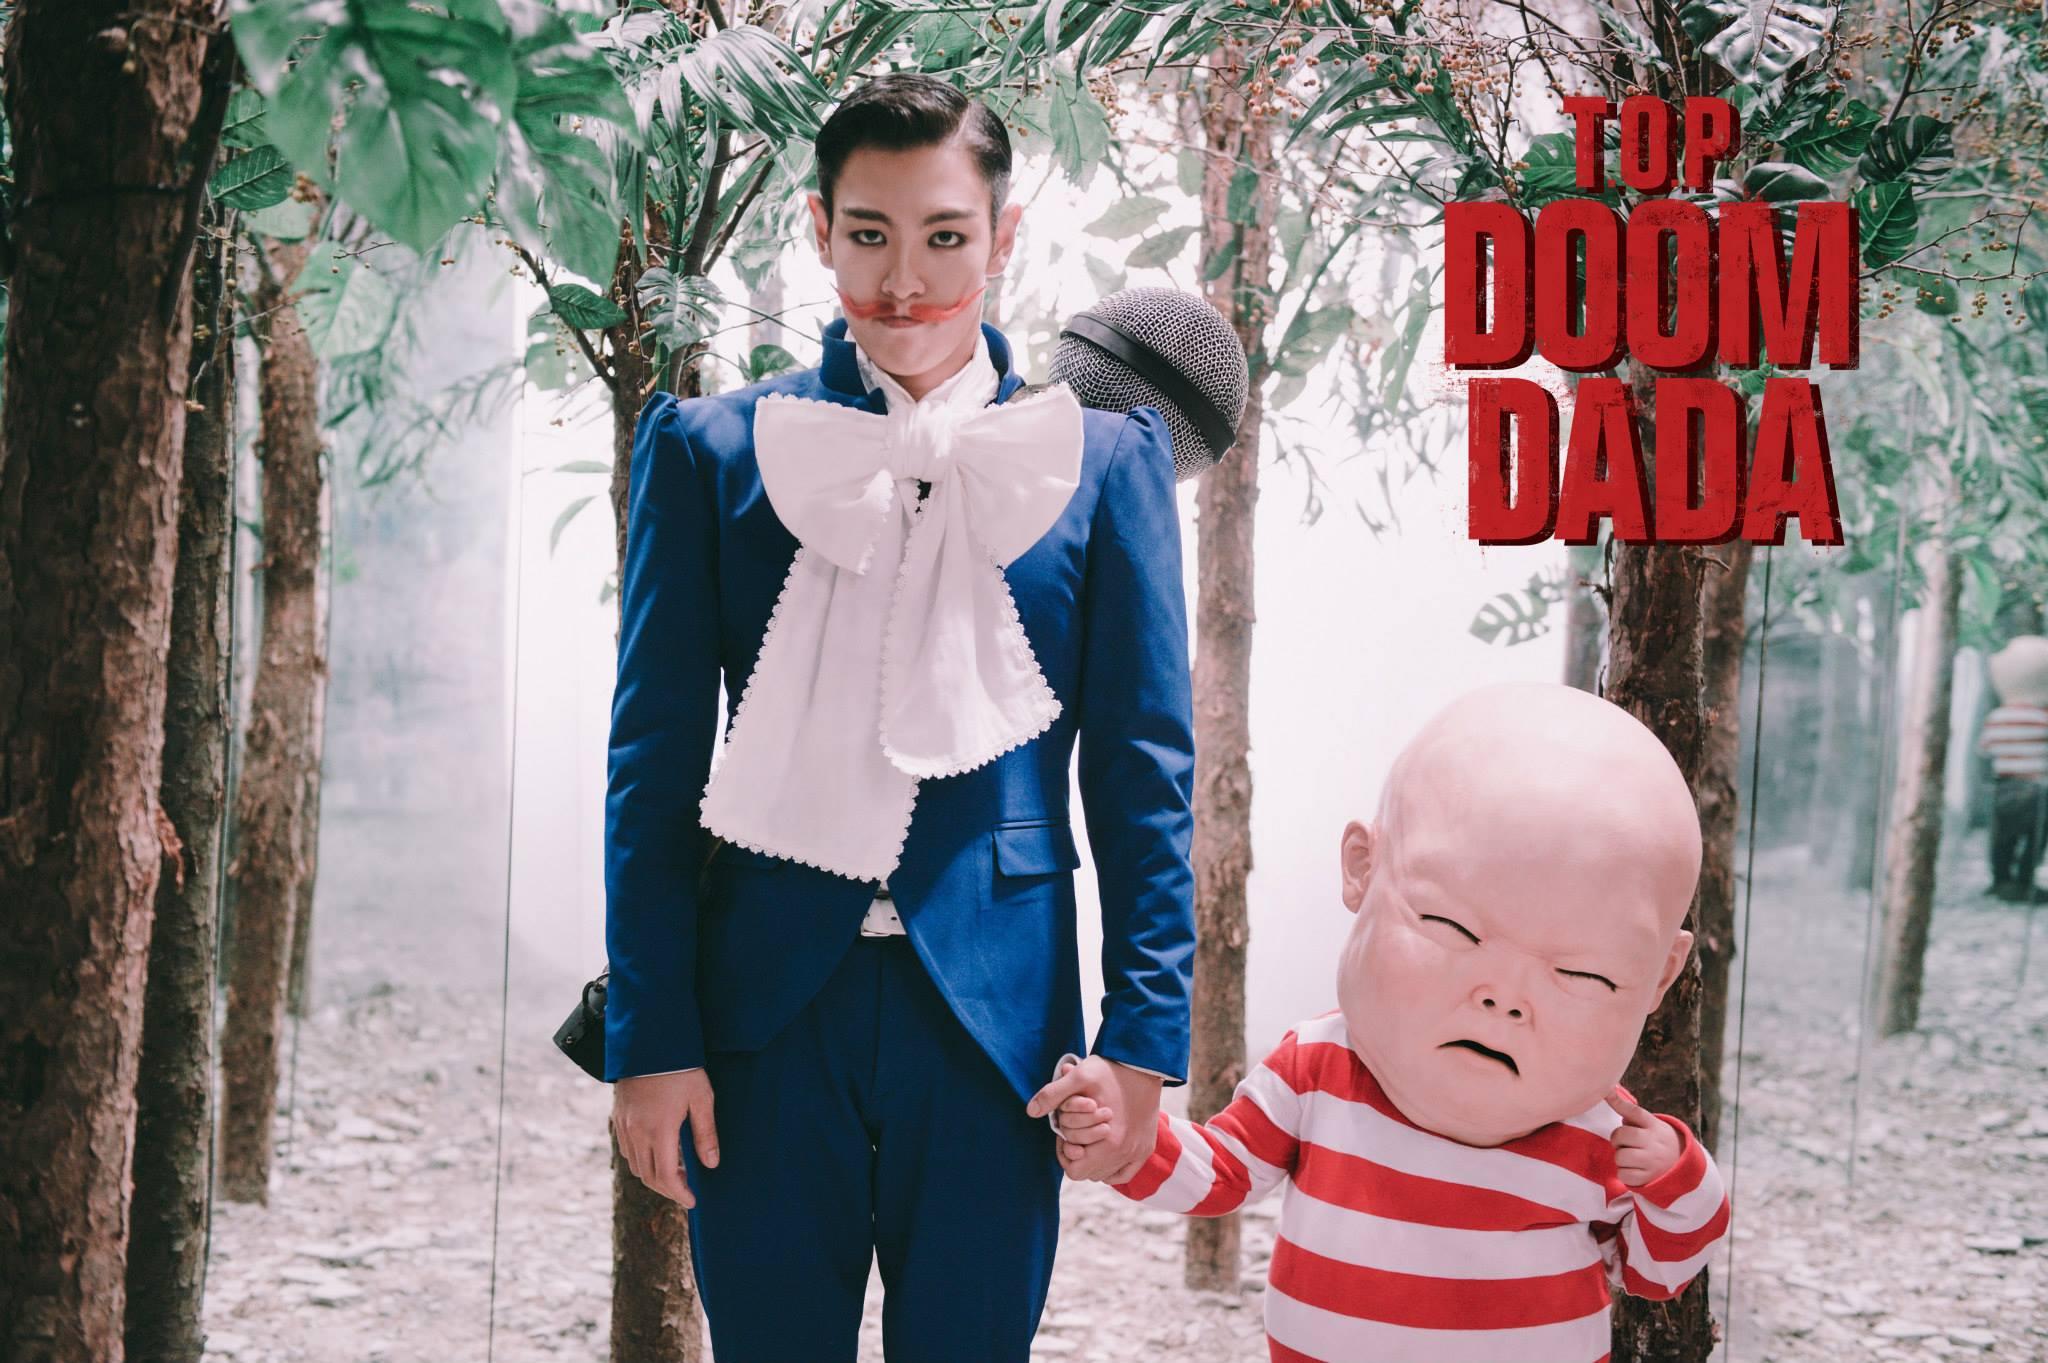 還記得2013年BIGBANG T.O.P推出的《Doom Dada》單曲嗎?